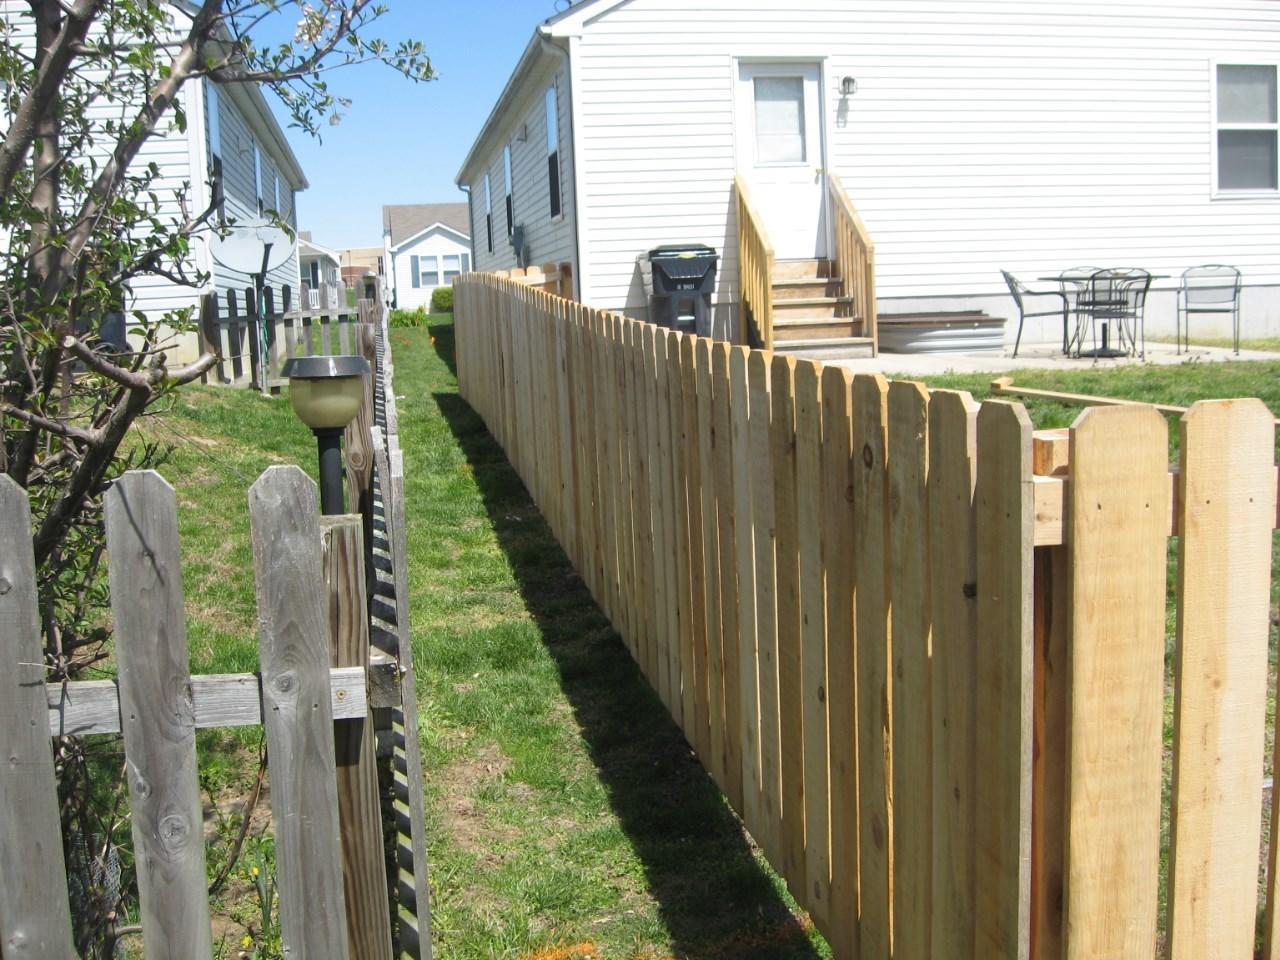 Cedar Picket Fencing Installed in Belleville, IL - After Photo